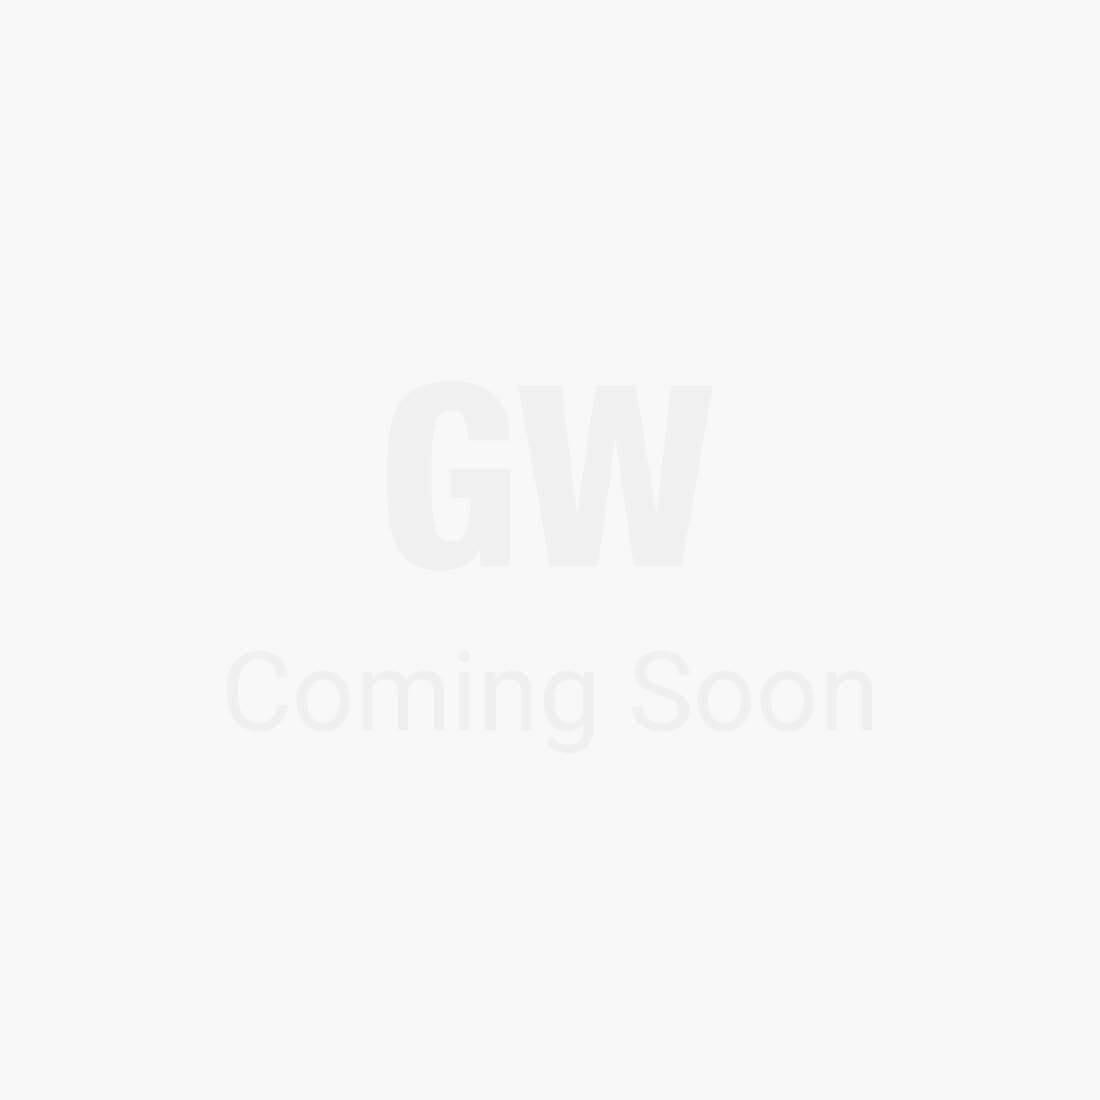 Stupendous Baha Sofa Lounge Chair Globewest Frankydiablos Diy Chair Ideas Frankydiabloscom